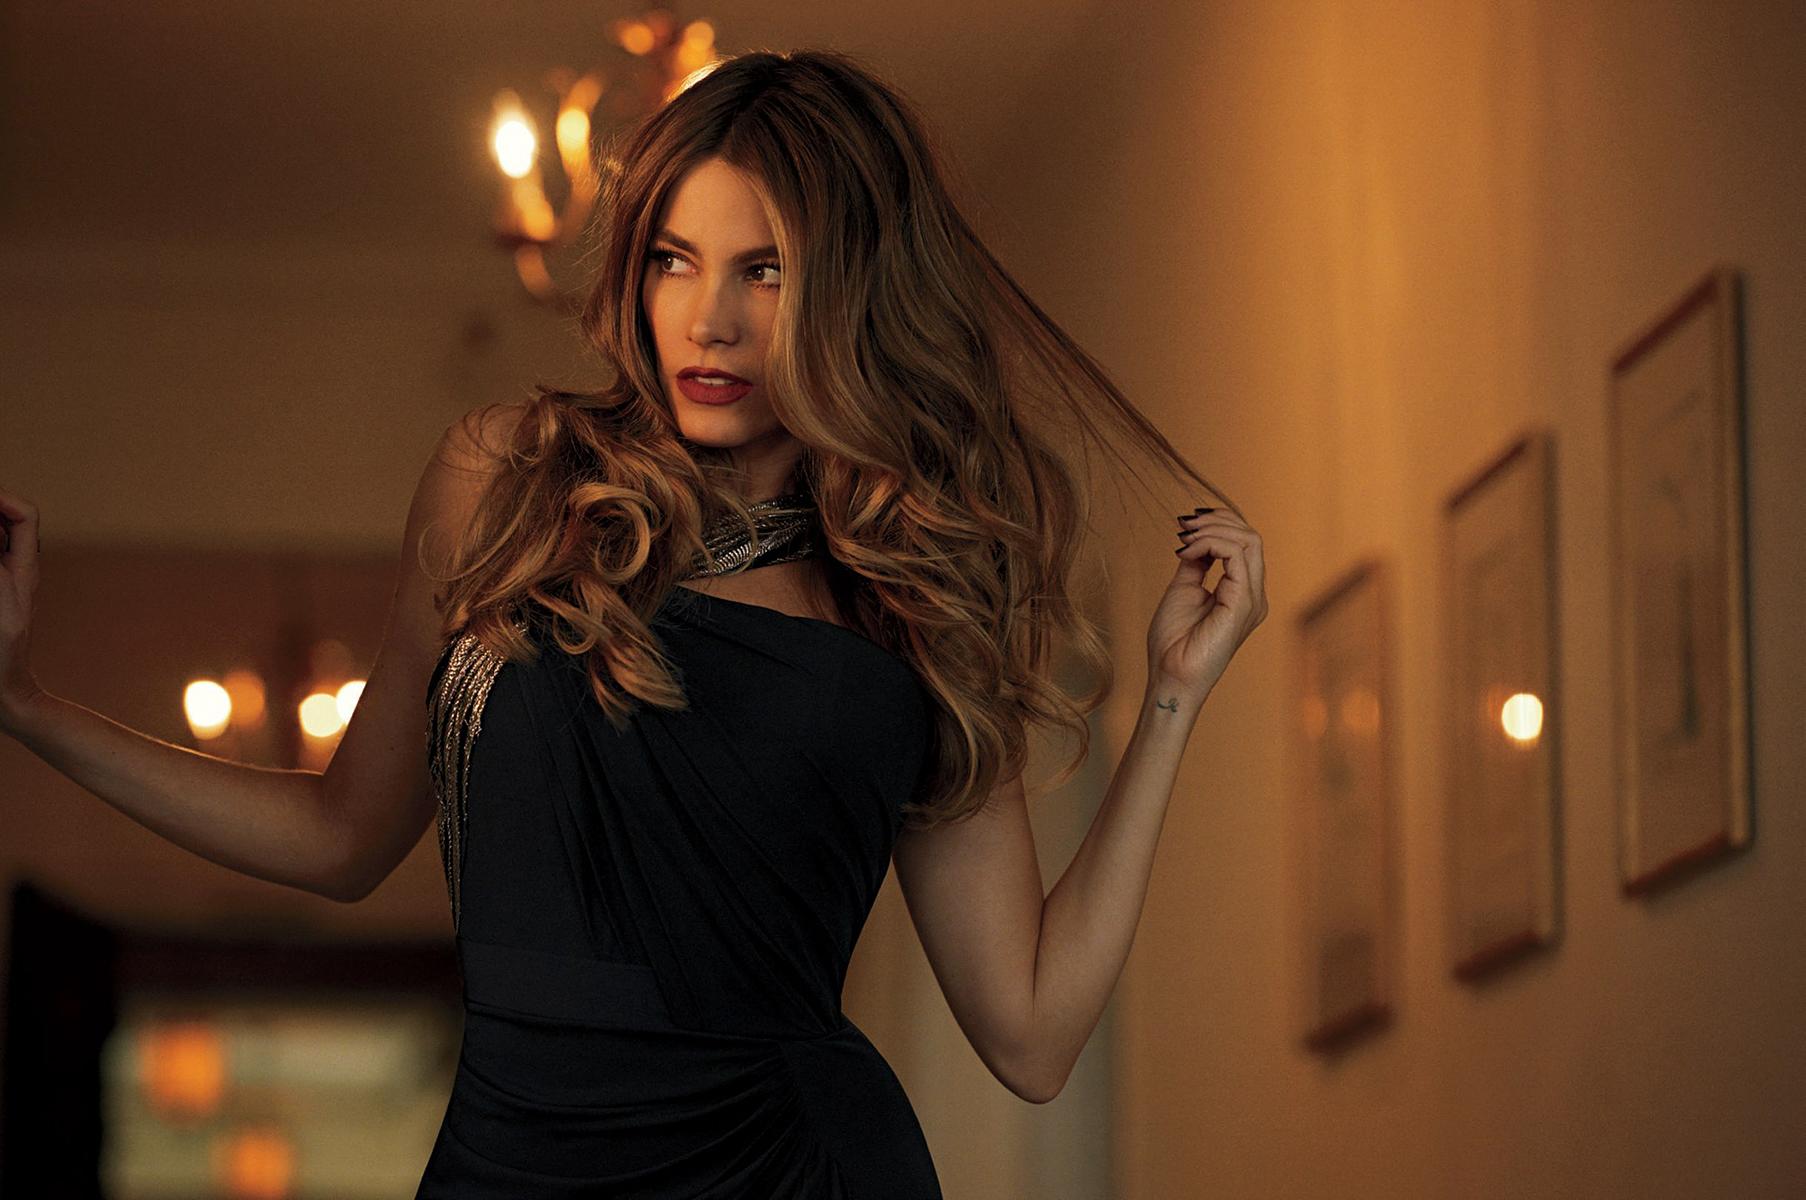 Sofia Vergara Nude Pics and Videos - - Top Nude Celebs New sofia vergara pictures